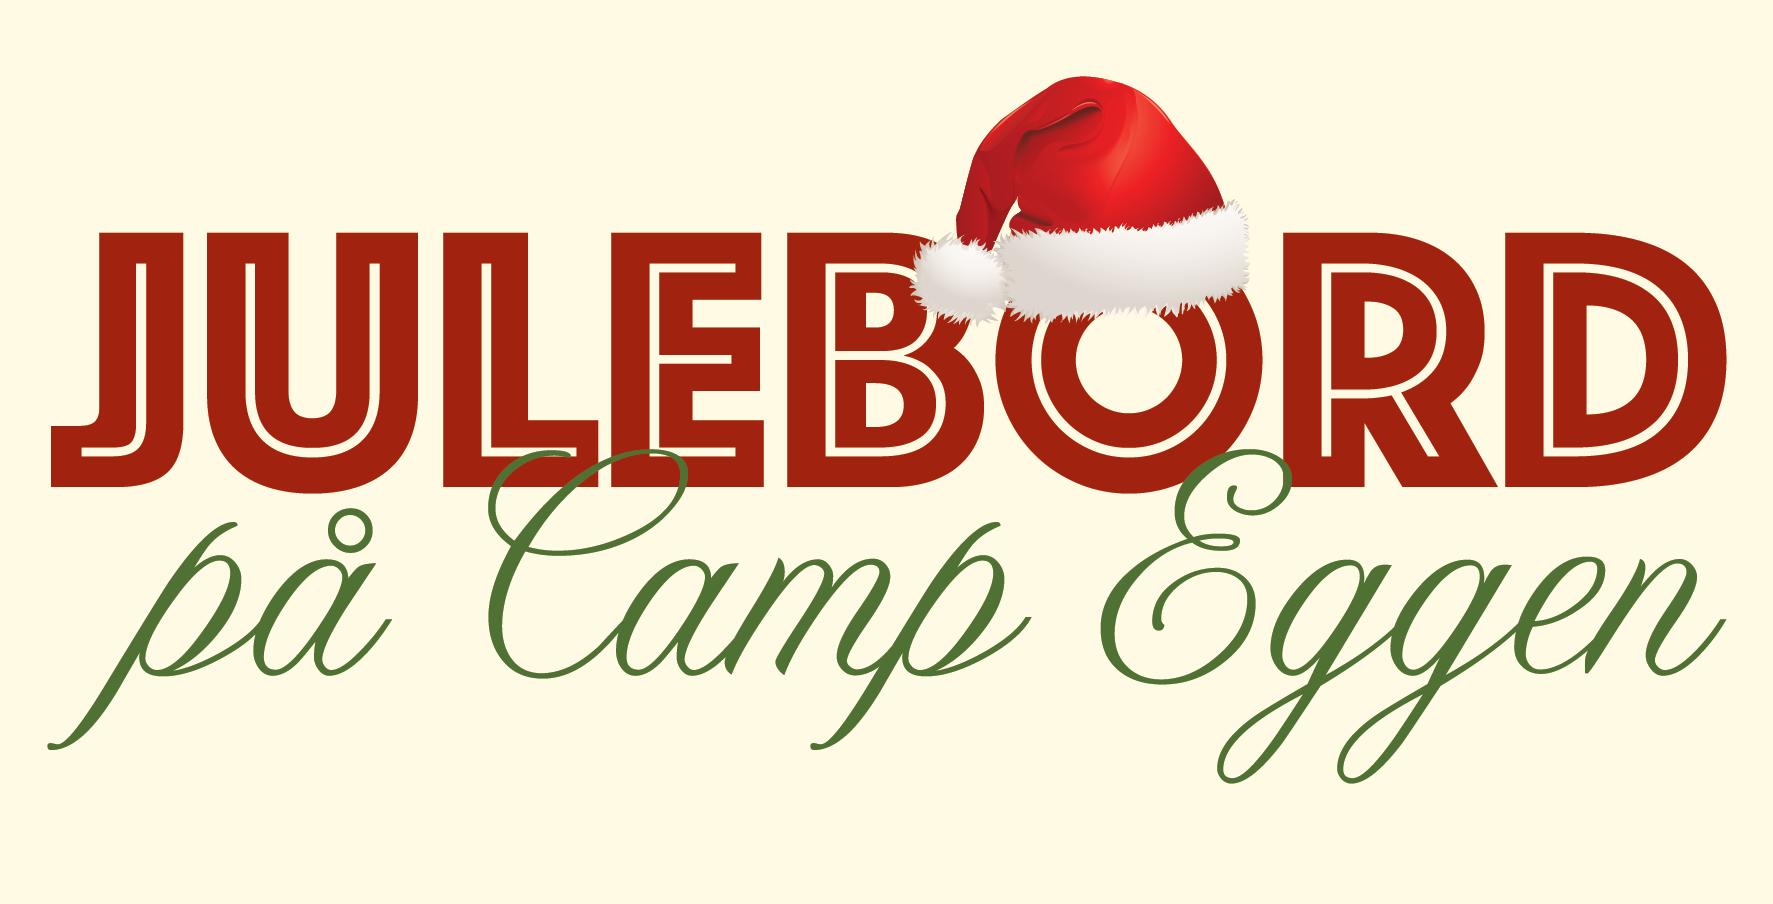 Julebord hos Camp Eggen